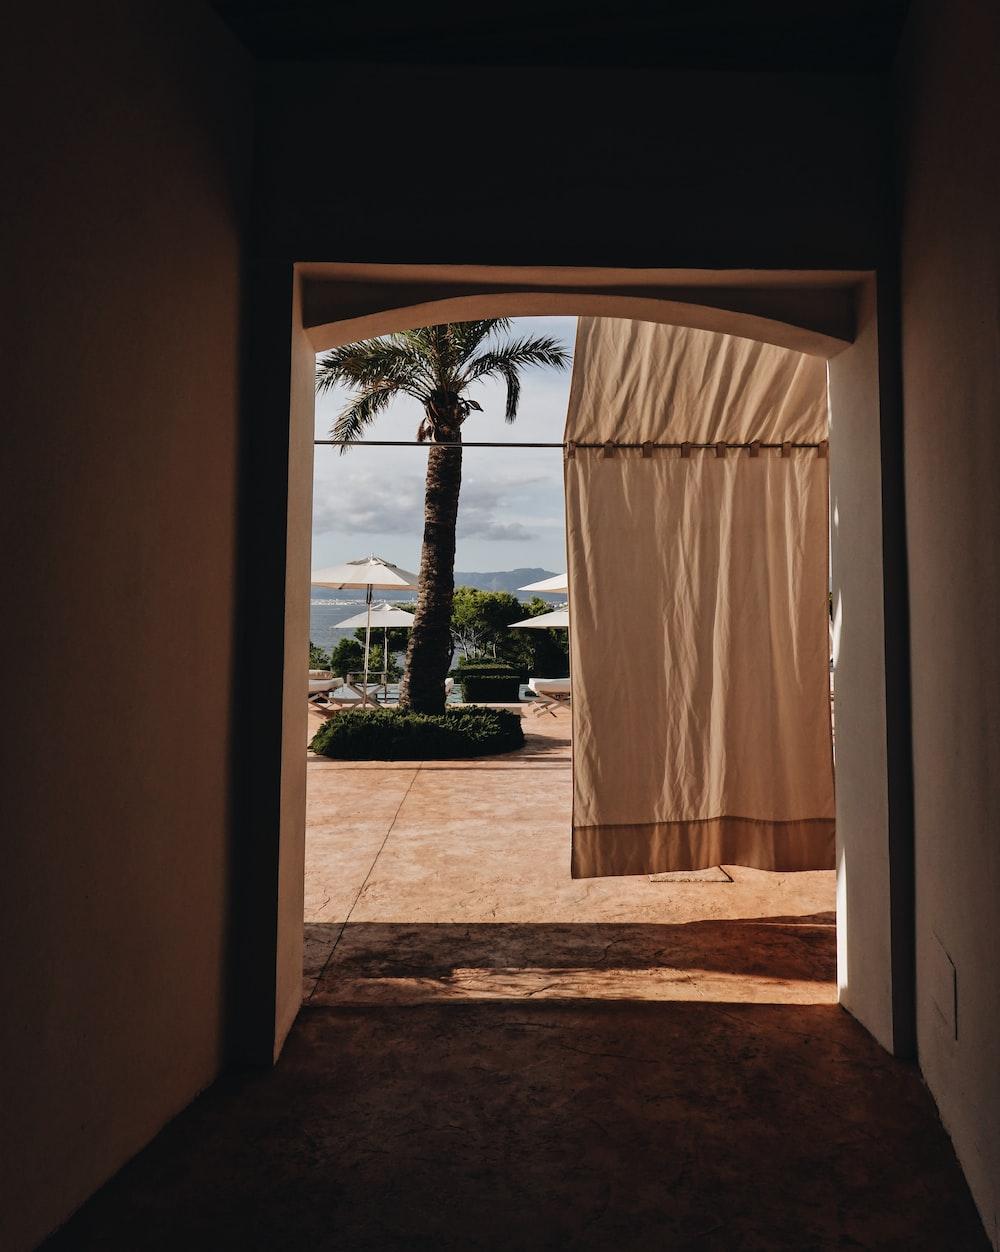 curtain hanging on rod in front of door